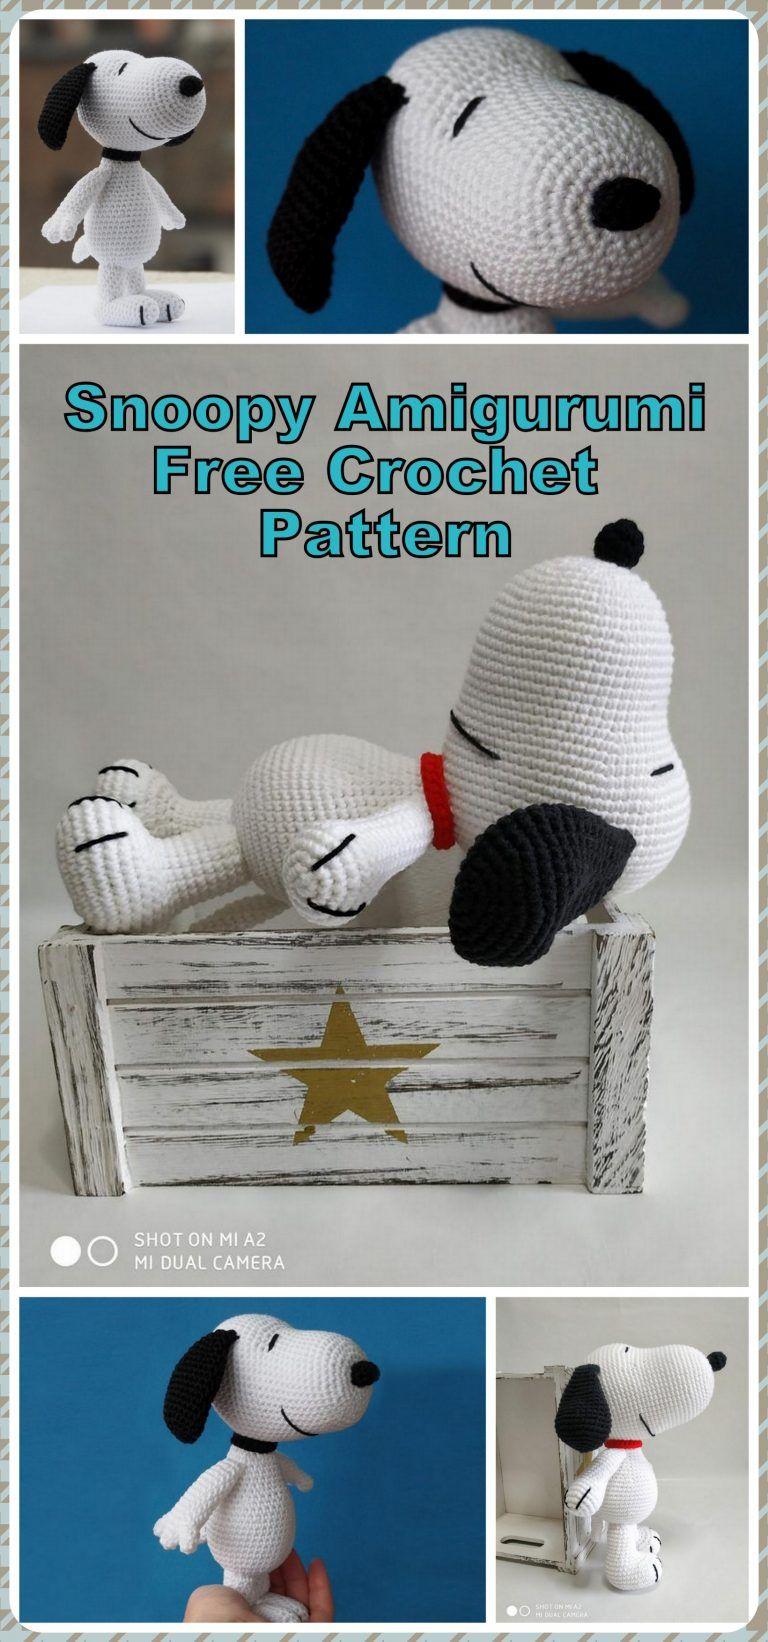 Amigurumi Dog Snoopy Free Crochet Pattern - Amigurumi Patterns #minioncrochetpatterns